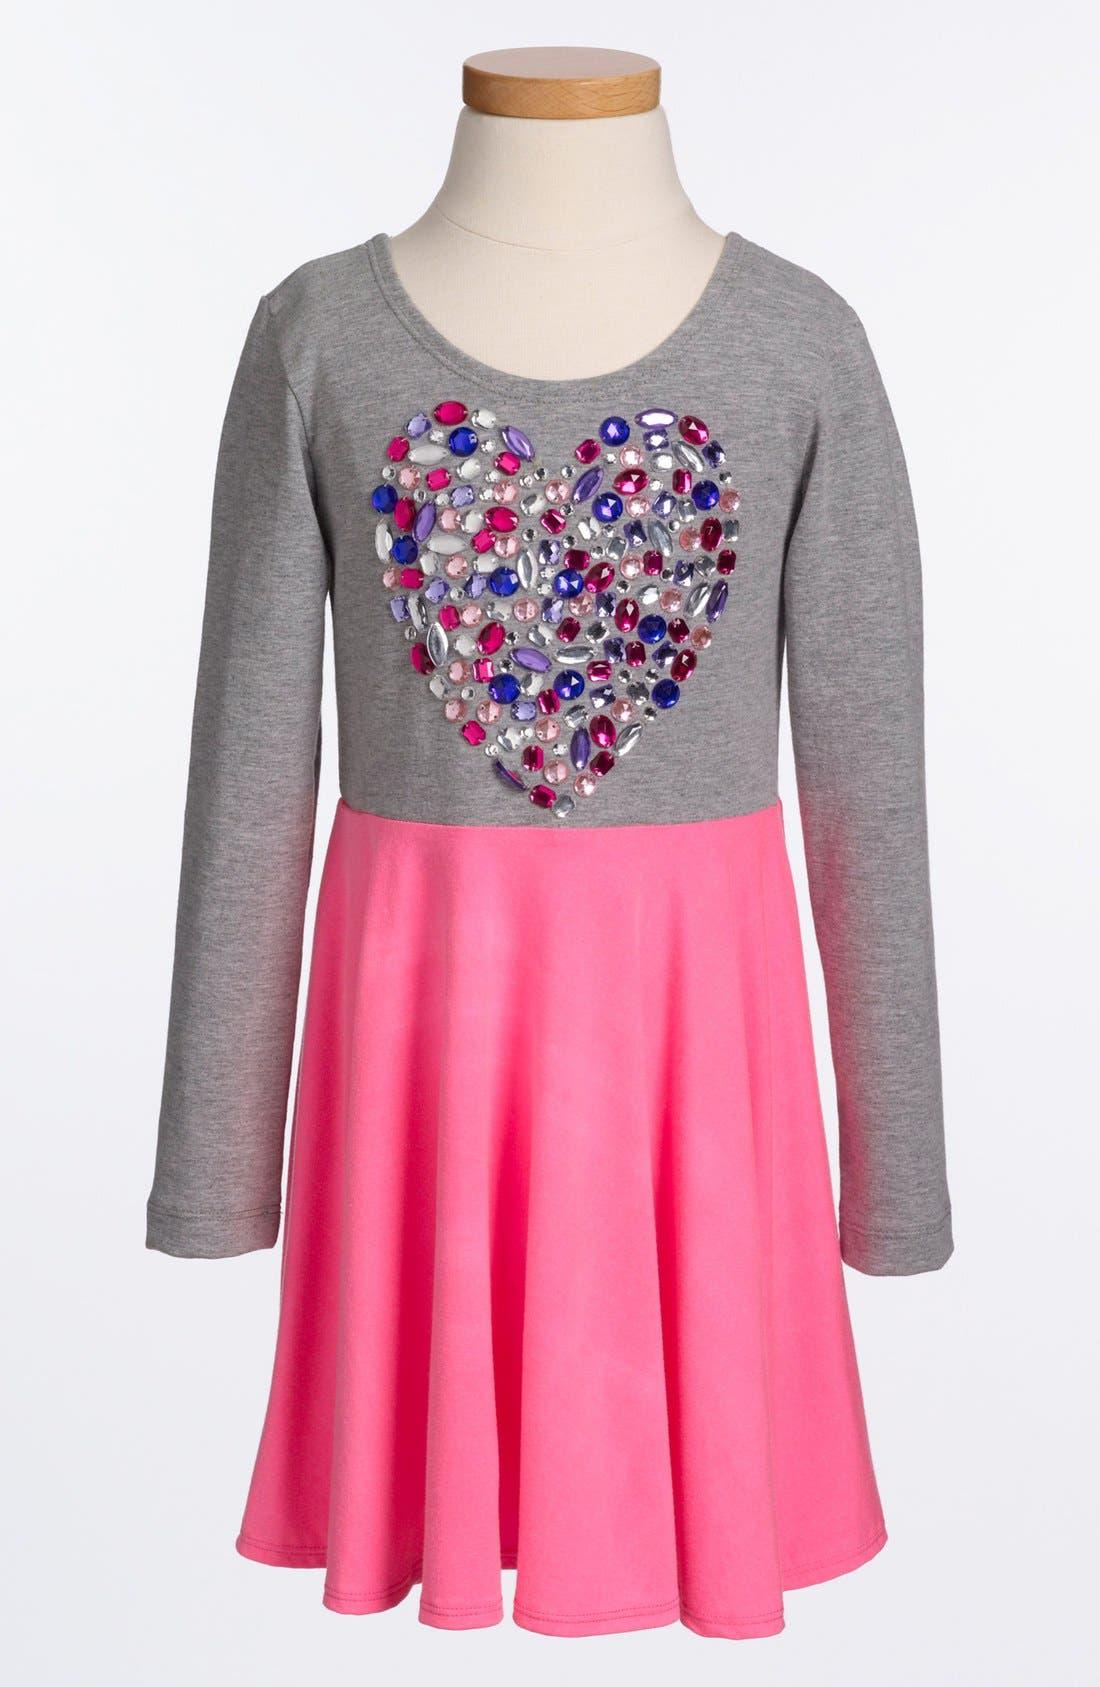 Main Image - Flowers By Zoe Heart Dress (Little Girls & Big Girls) (Online Only)